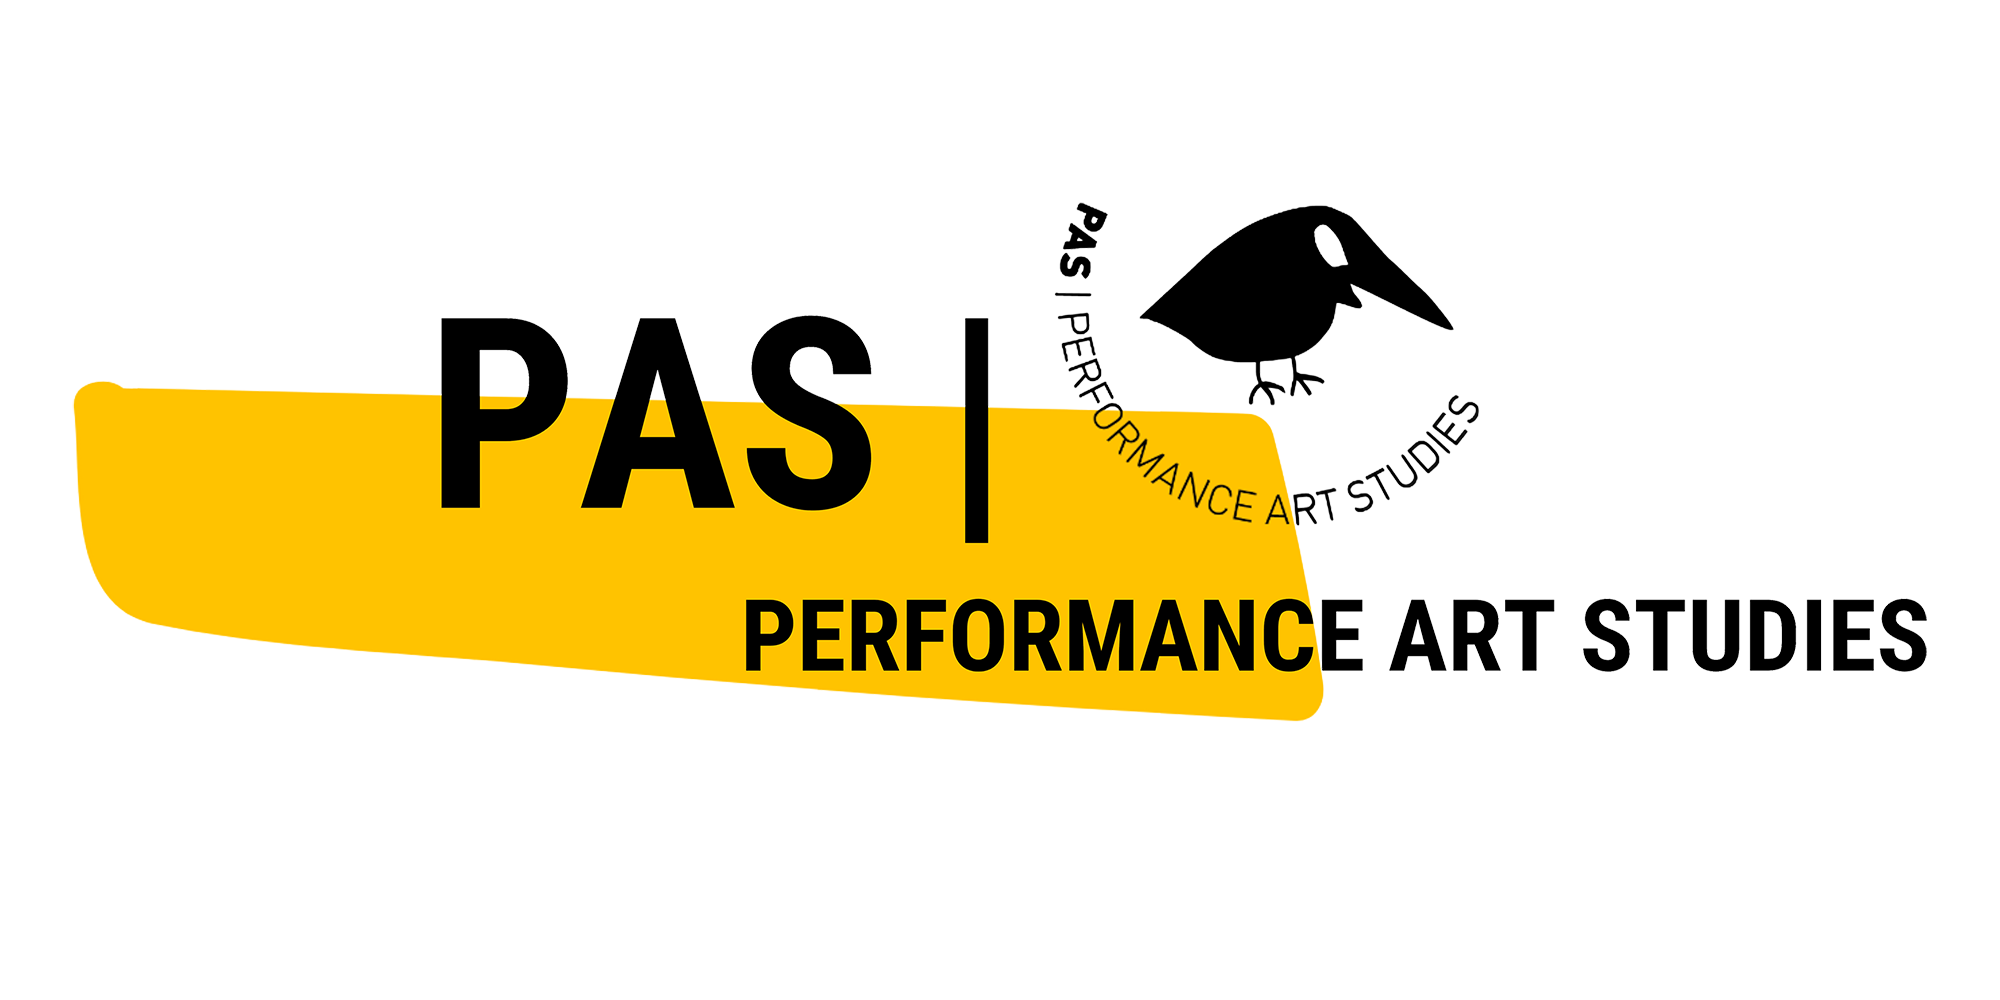 PAS performance art studies